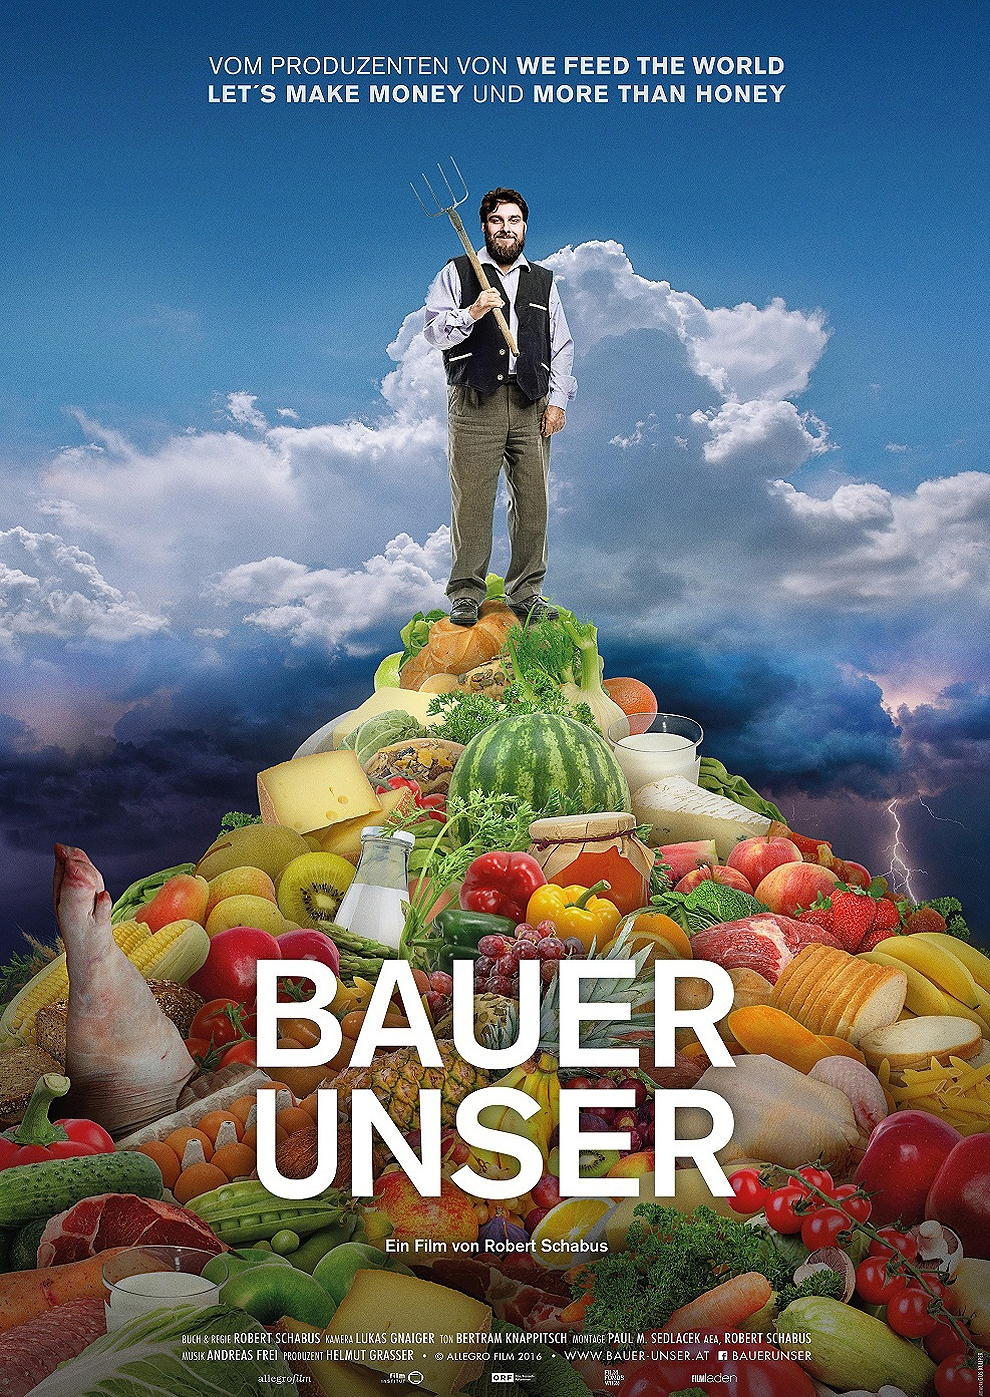 Bauer unser (Poster)